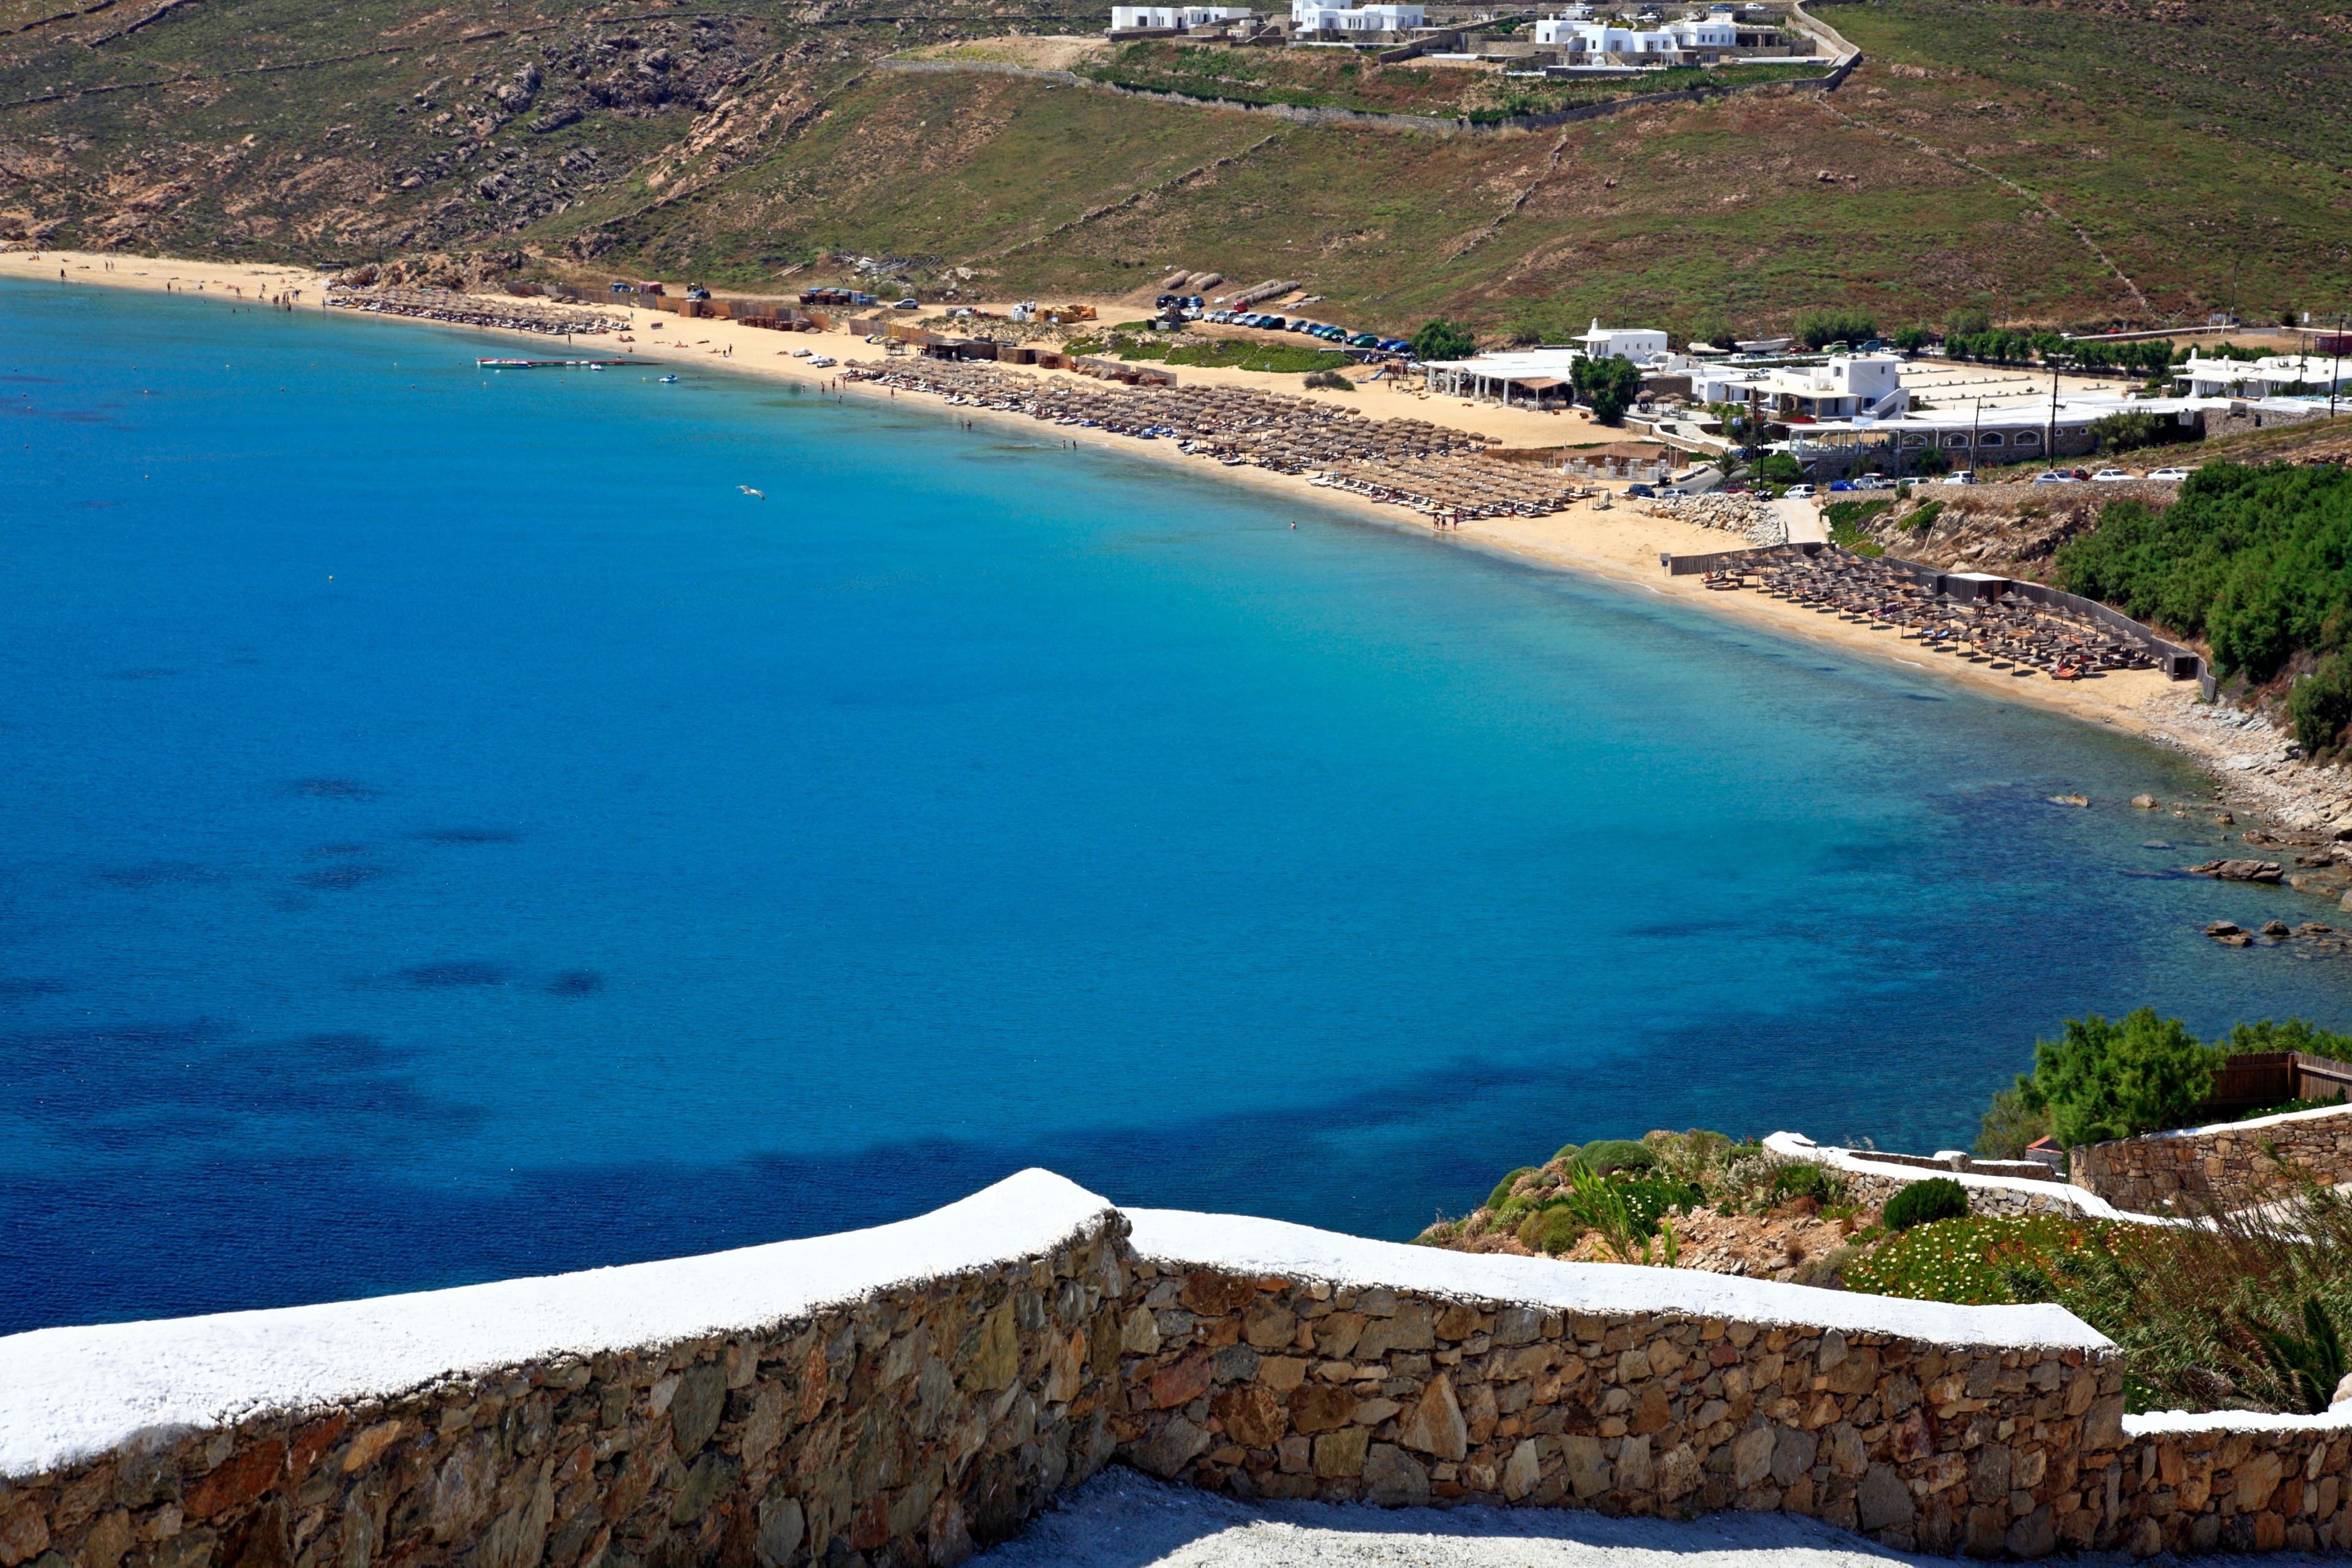 Elia, Mykonos, South Aegean, Greece